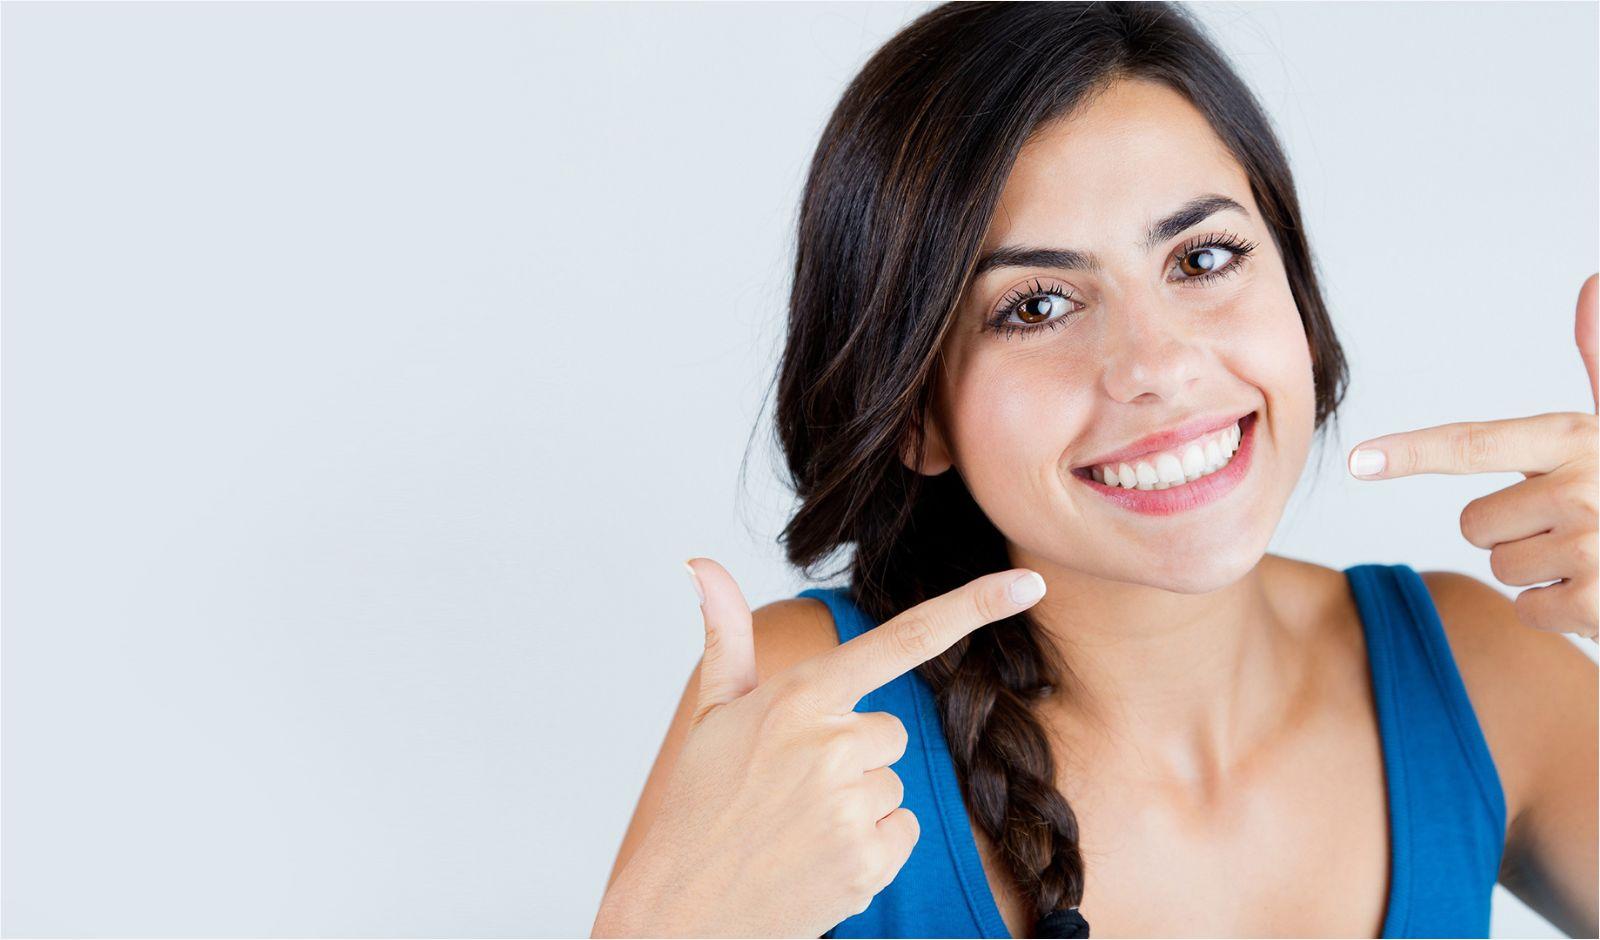 Create your brightest smile